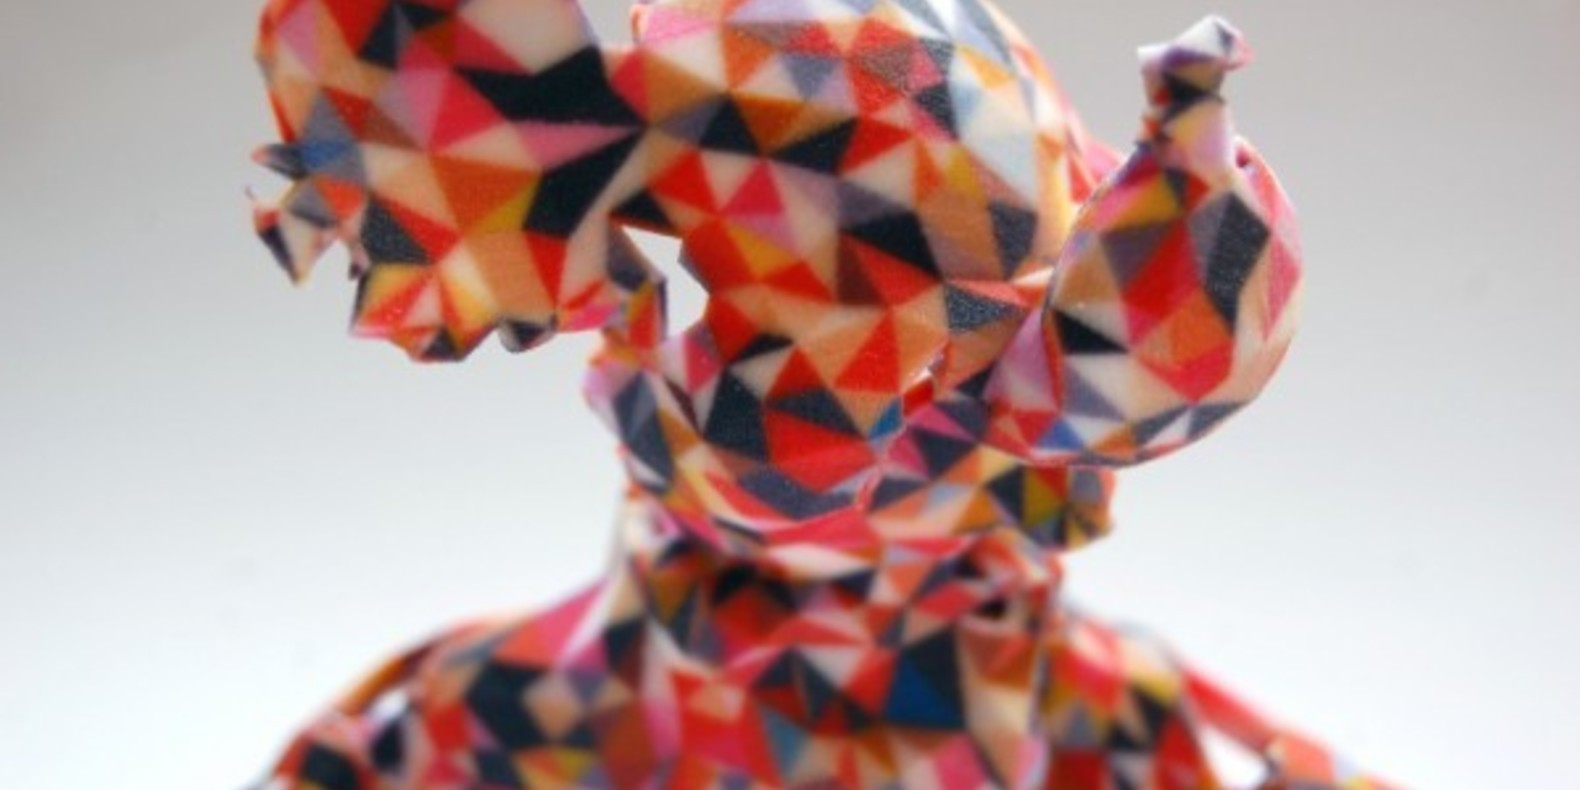 sekuMoiMecy Matthew Plummer-Fernandez impression 3D printing cults fichier mickey mouse 4